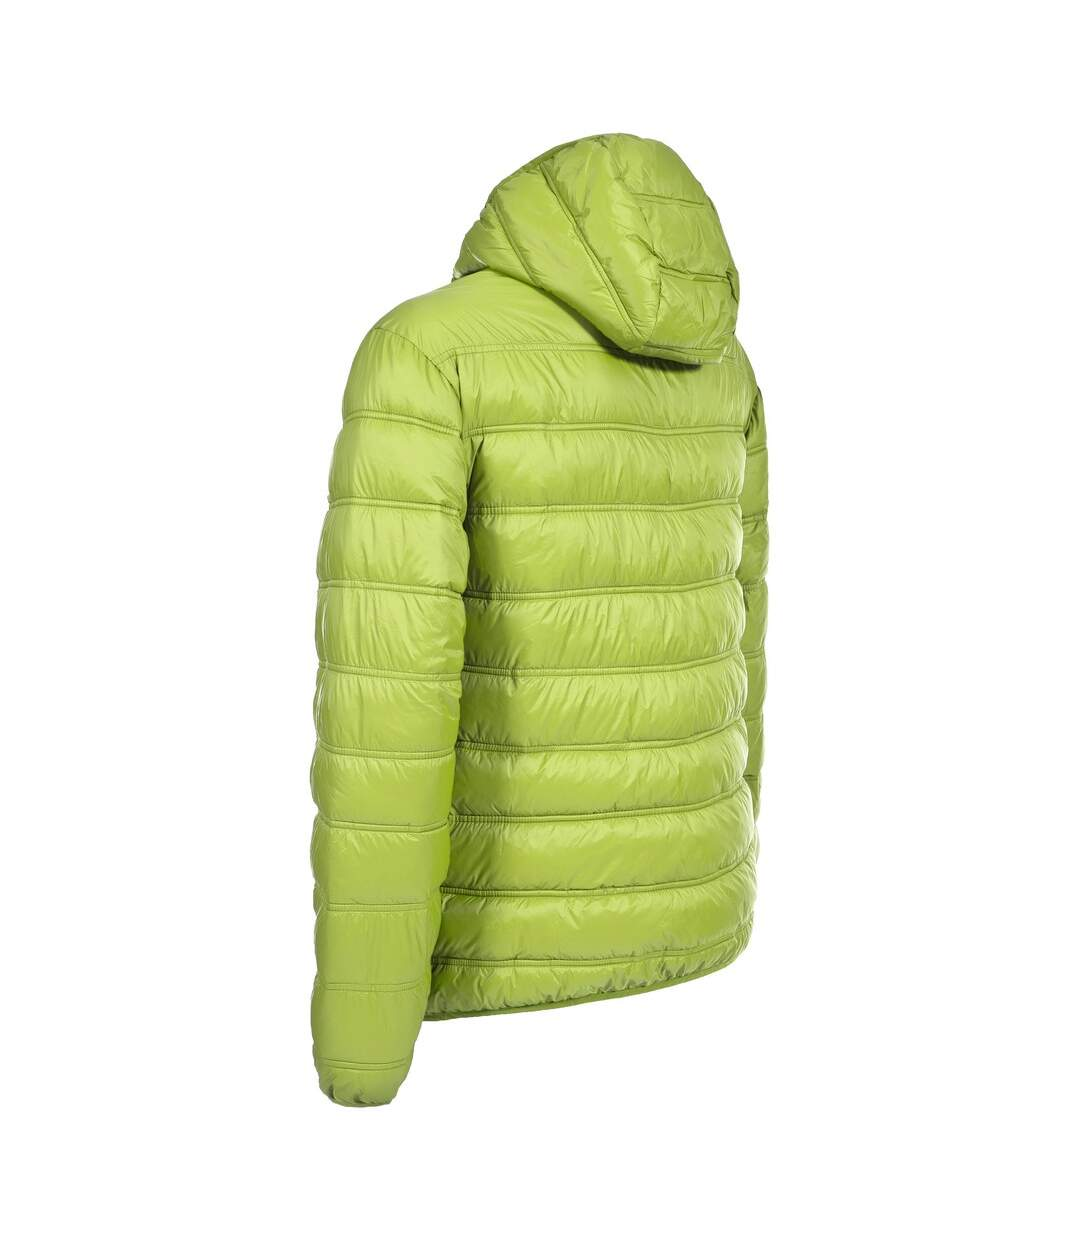 Trespass Mens Irrate Padded Jacket (Citron) - UTTP1142